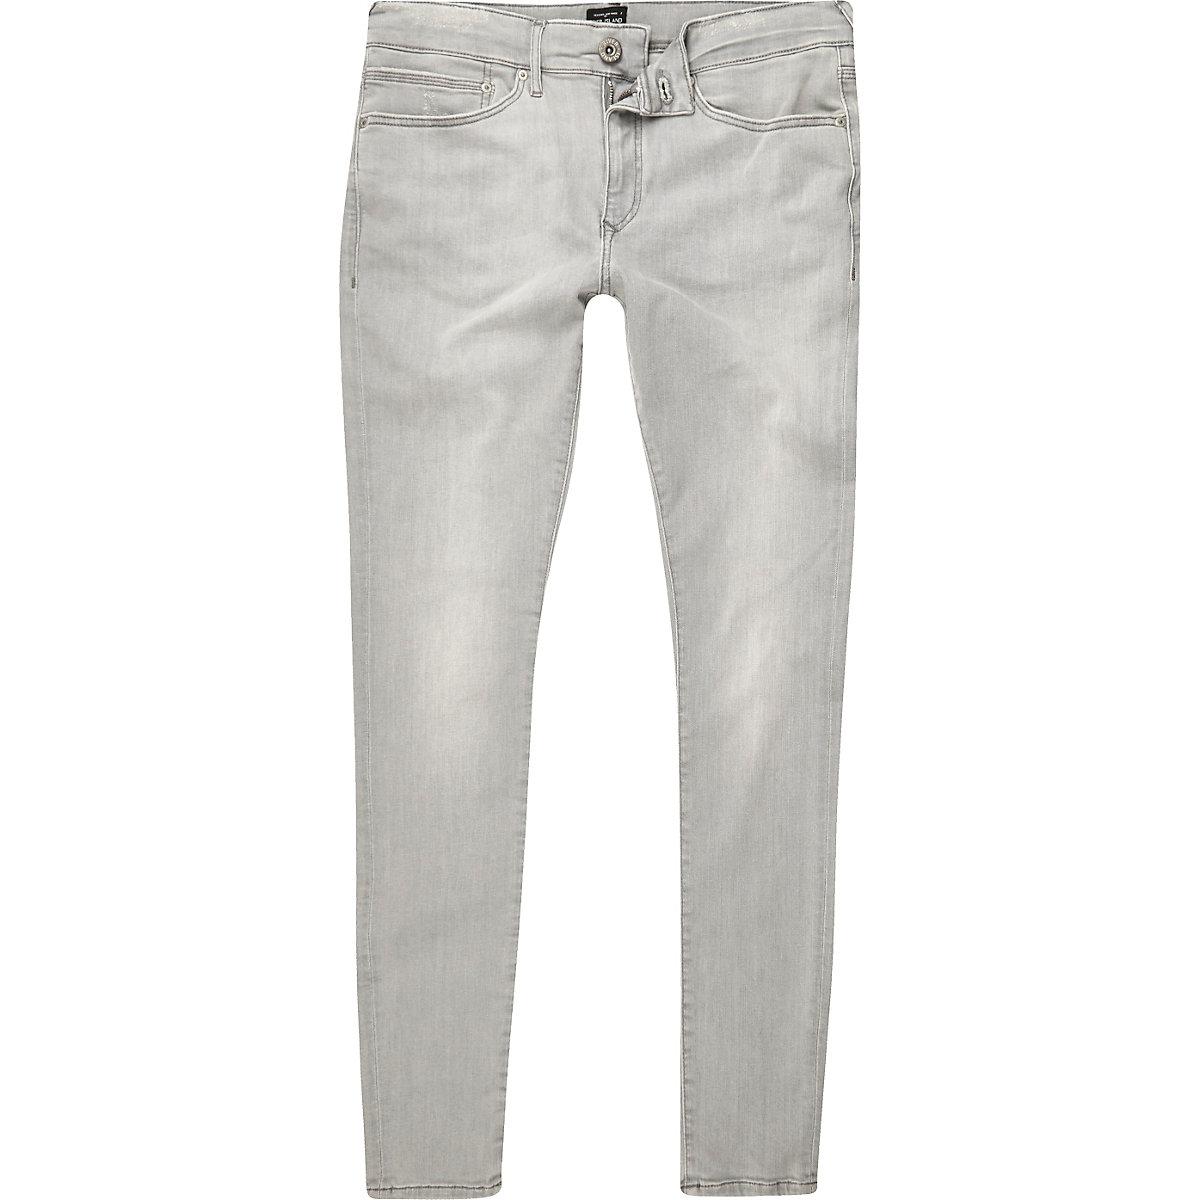 Grey wash Ollie spray on super skinny jeans